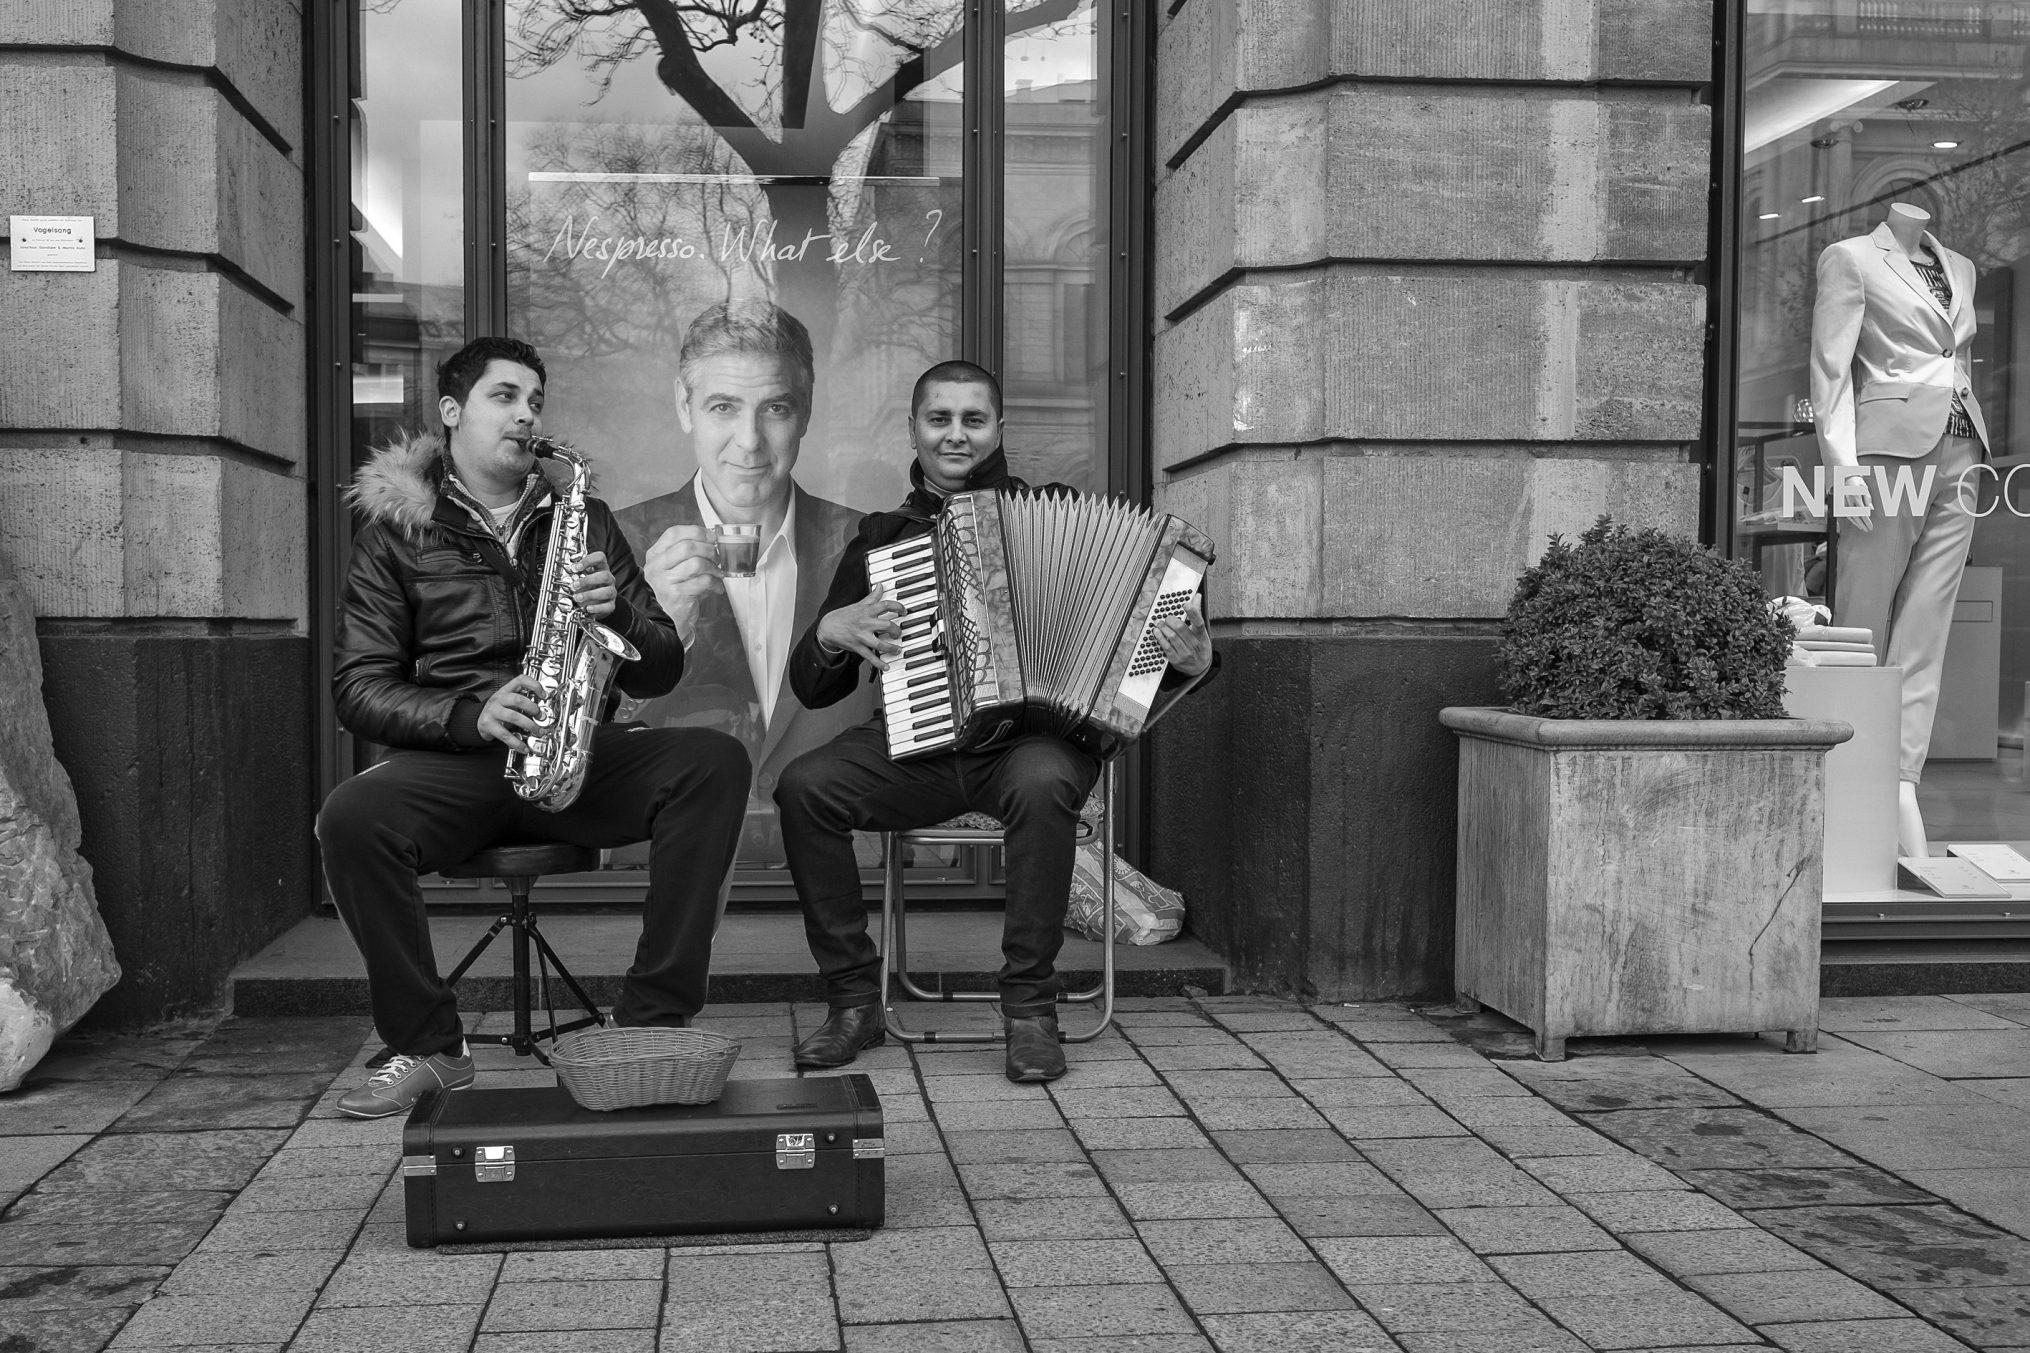 Straßenmusiker. Bildnachweis: Thomas Kurek